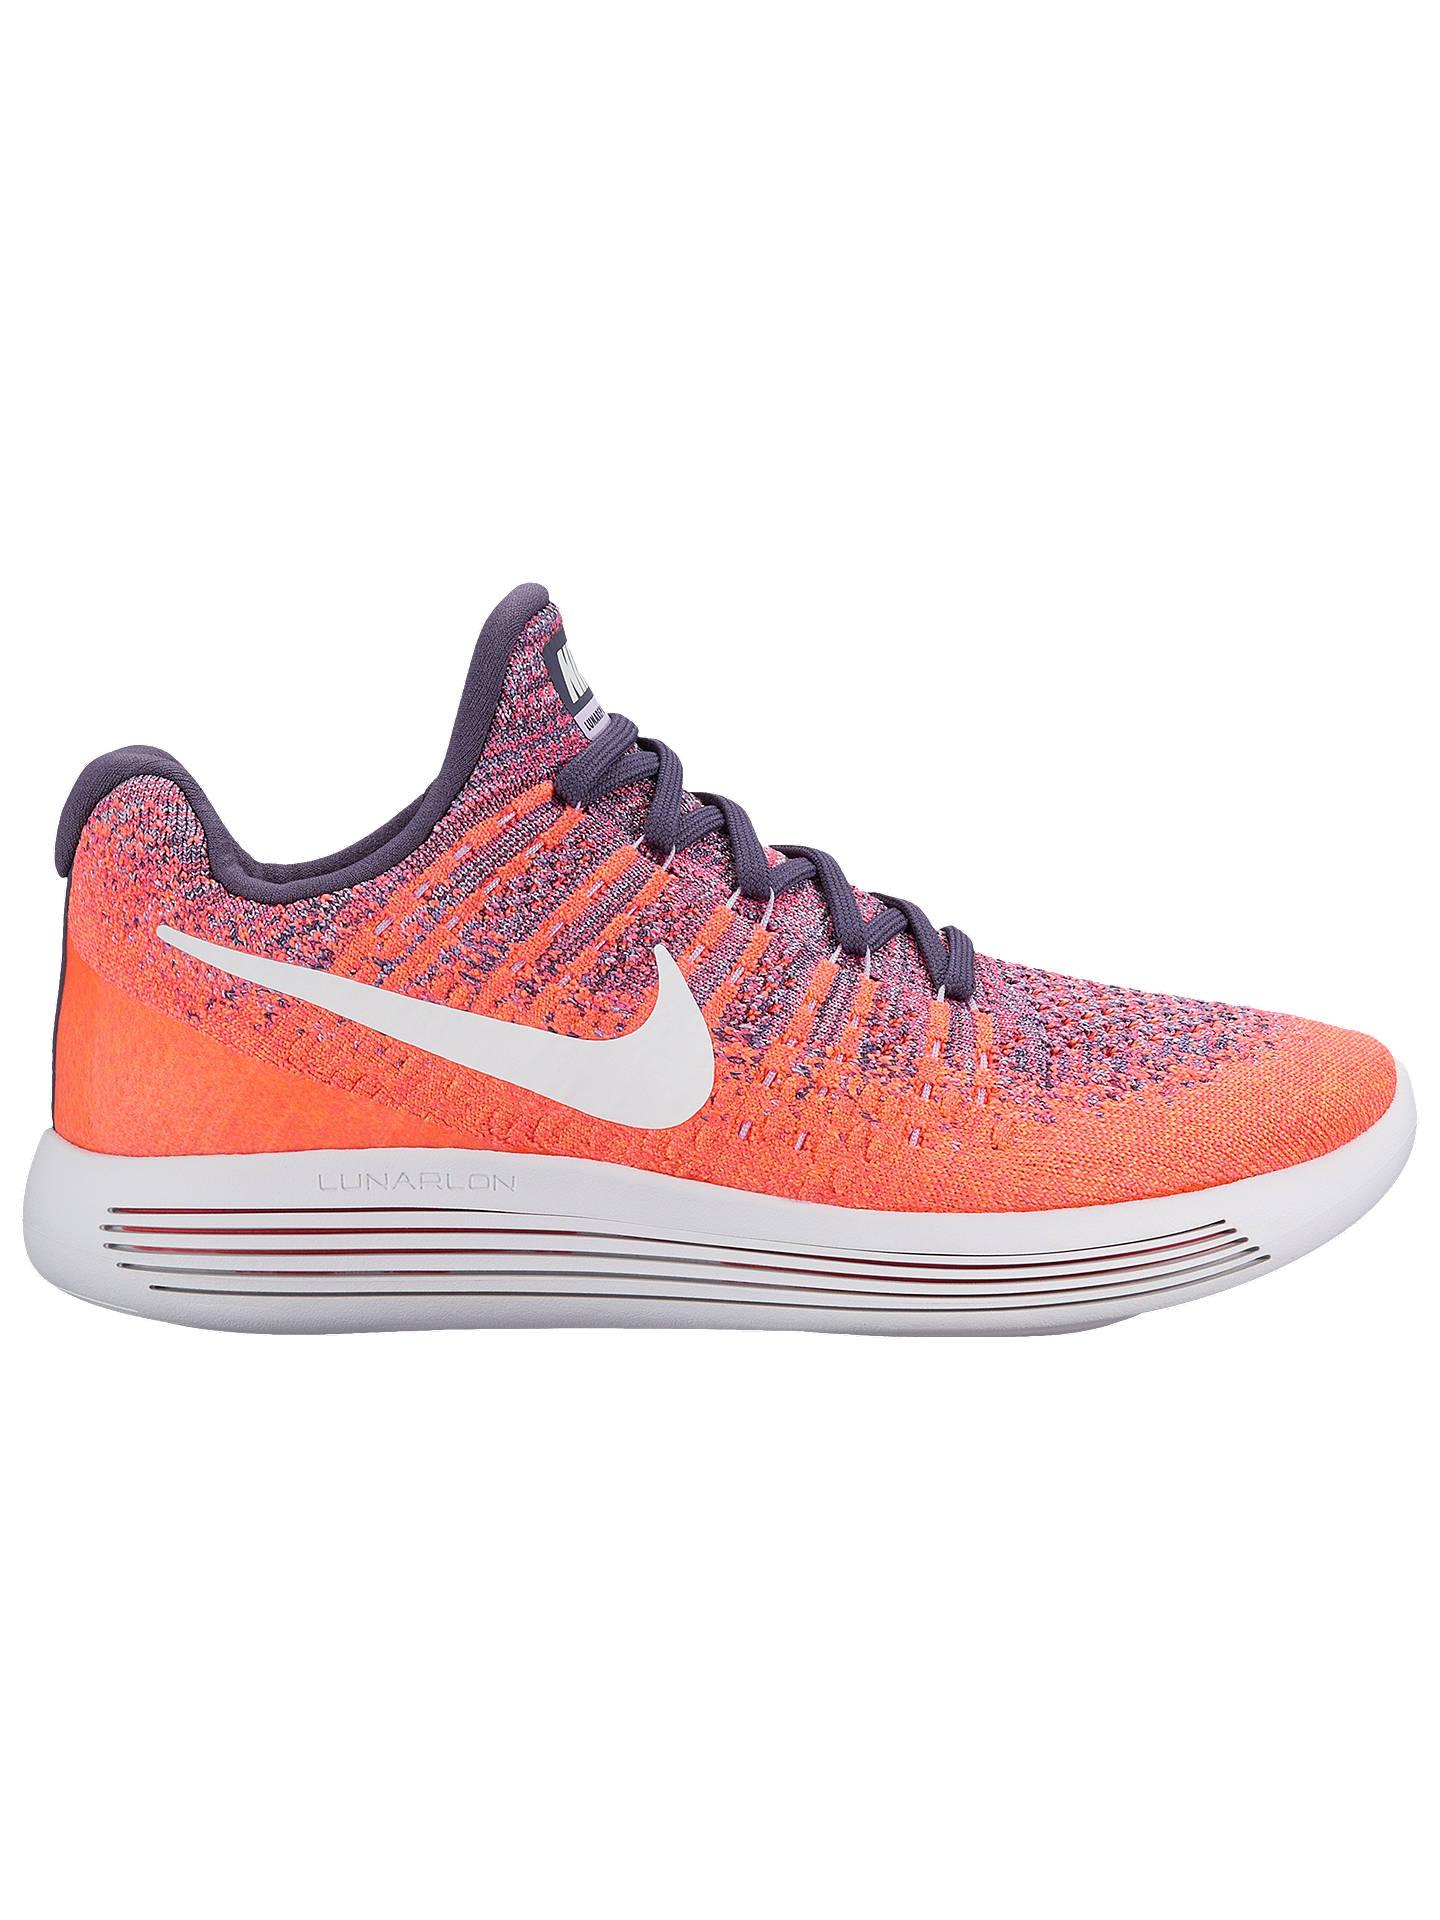 baf94e2cb58d Buy Nike LunarEpic Low Flyknit 2 Women s Running Shoes